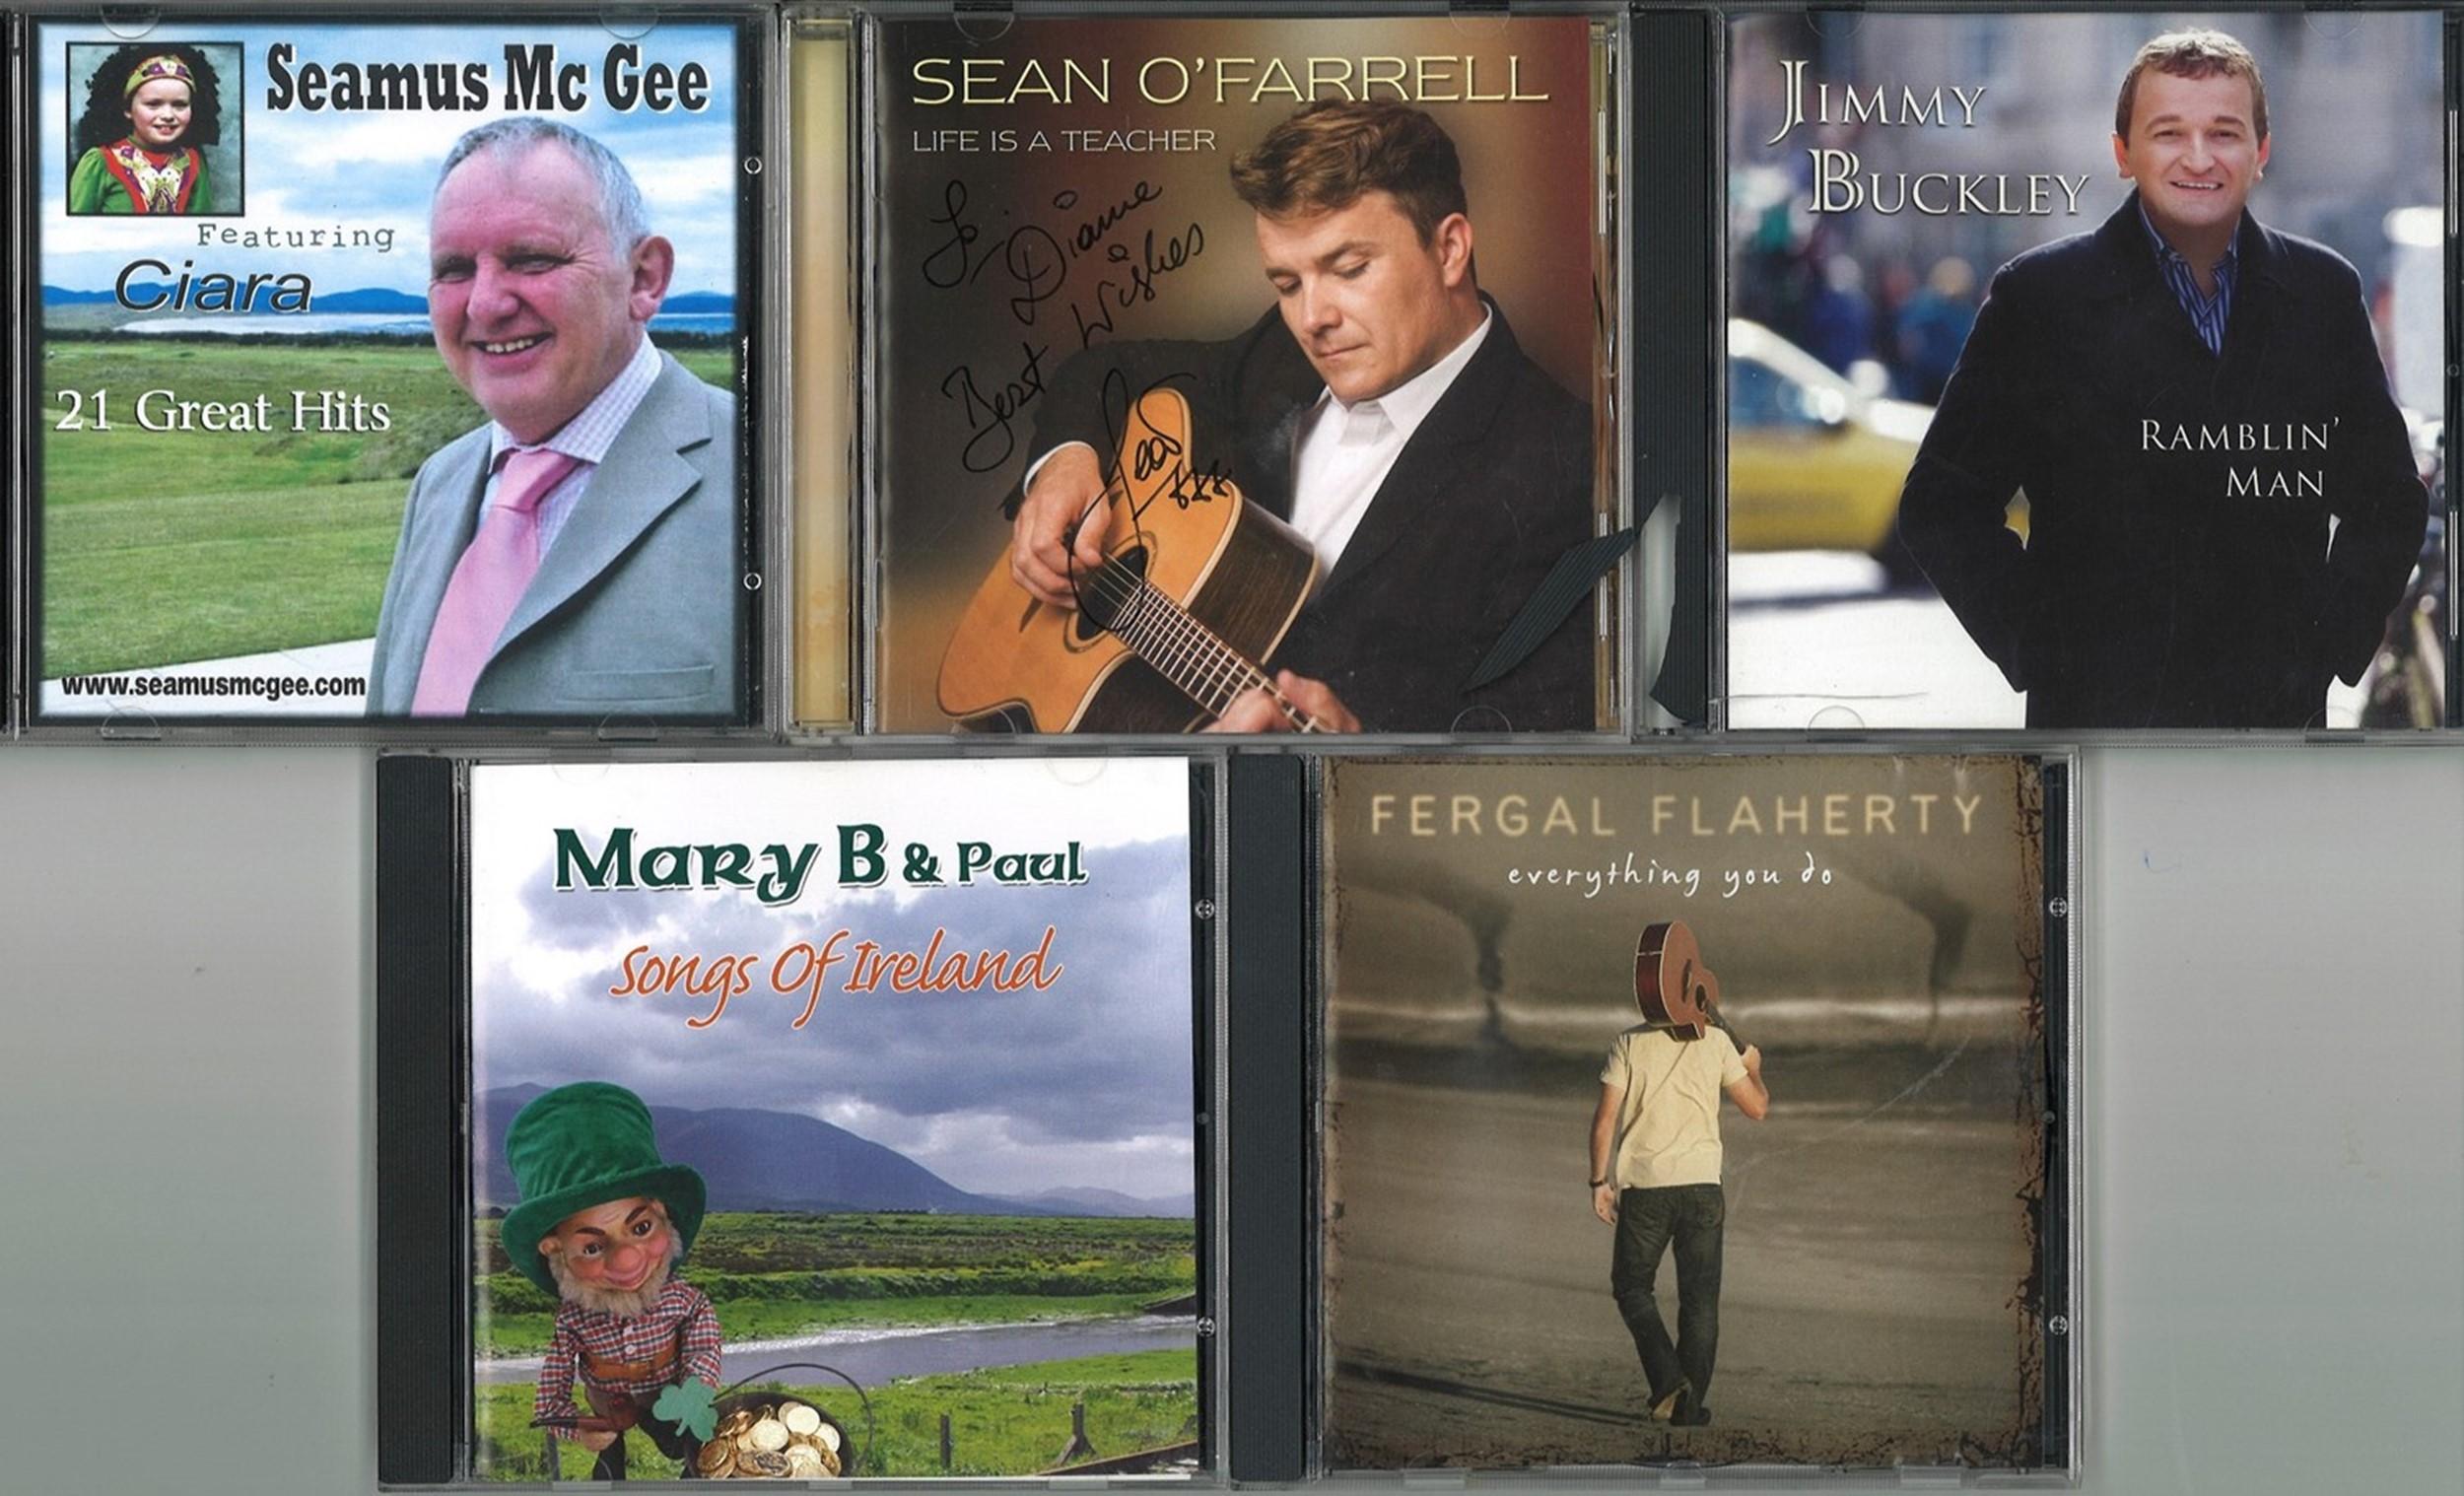 5 Signed CDs, Jimmy Buckley, Sean O'Farrell, Seamus McGee, Fergal Flaherty, Mary B and Paul. Good